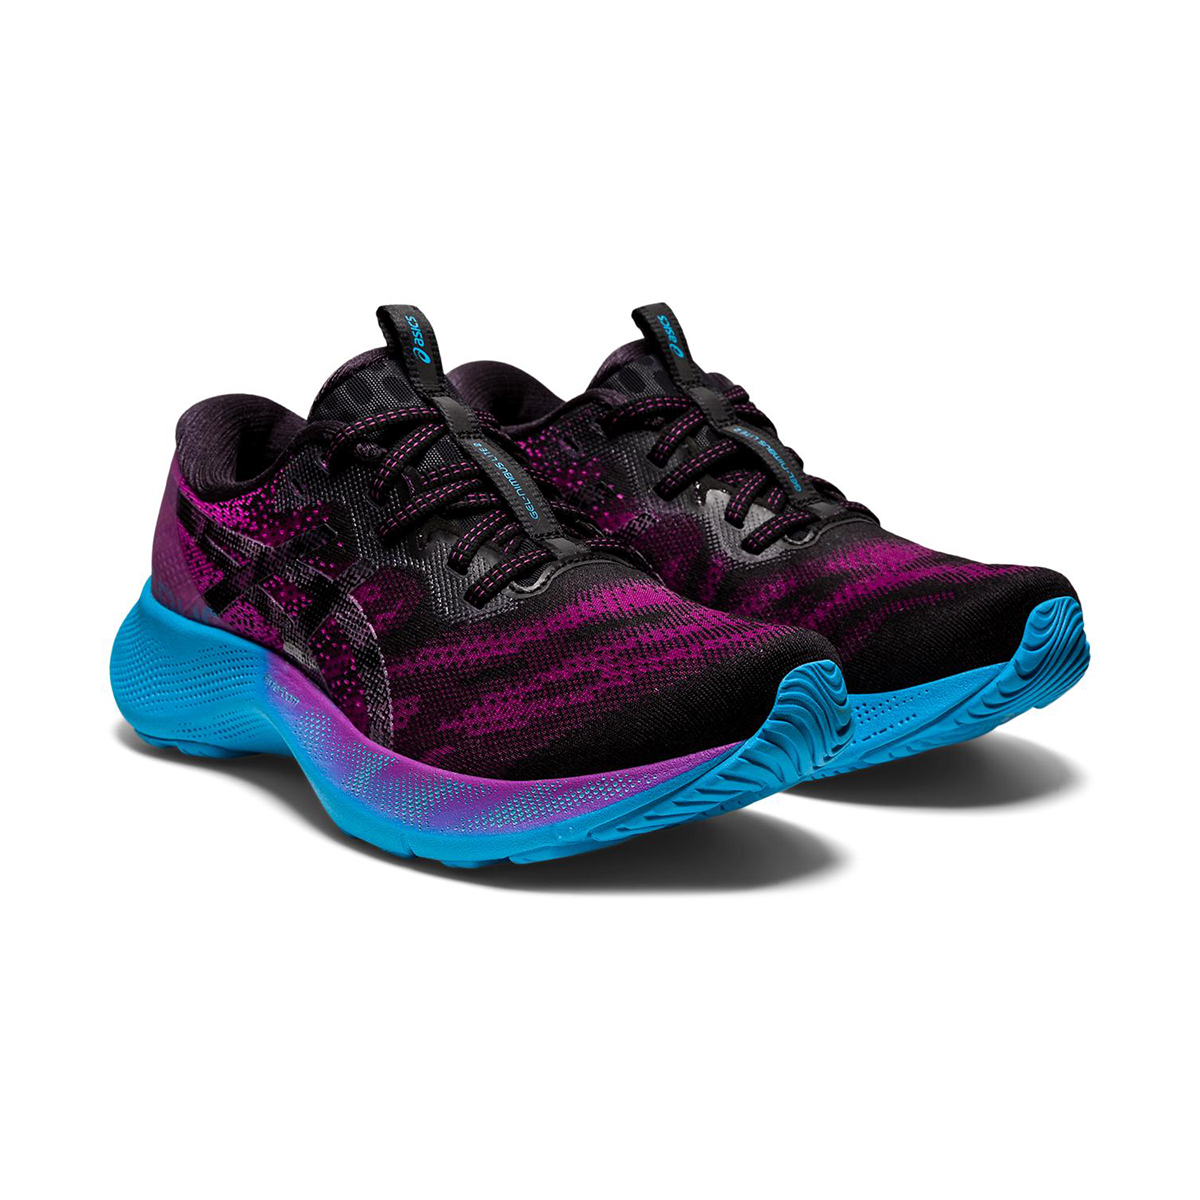 Women's Asics Gel-Nimbus Lite 2 Running Shoe - Color: Digital Grape/Black - Size: 5 - Width: Regular, Digital Grape/Black, large, image 3